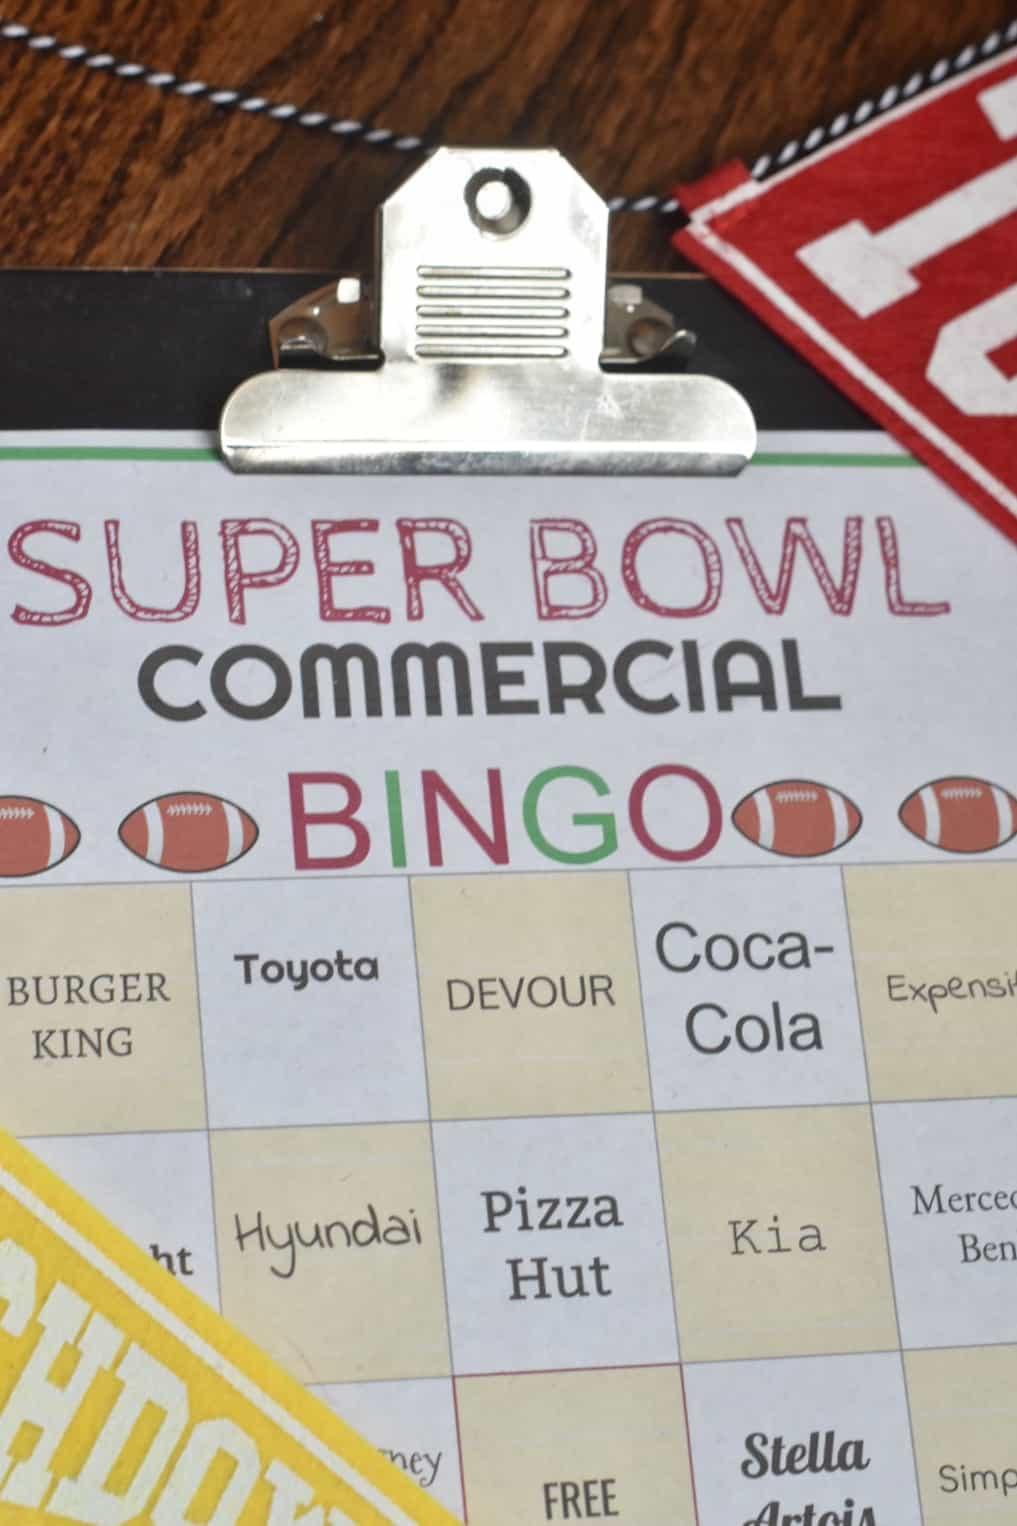 photo relating to Printable Super Bowl Bingo Cards named Tremendous Bowl 2019 BINGO Playing cards No cost Printable - Espresso